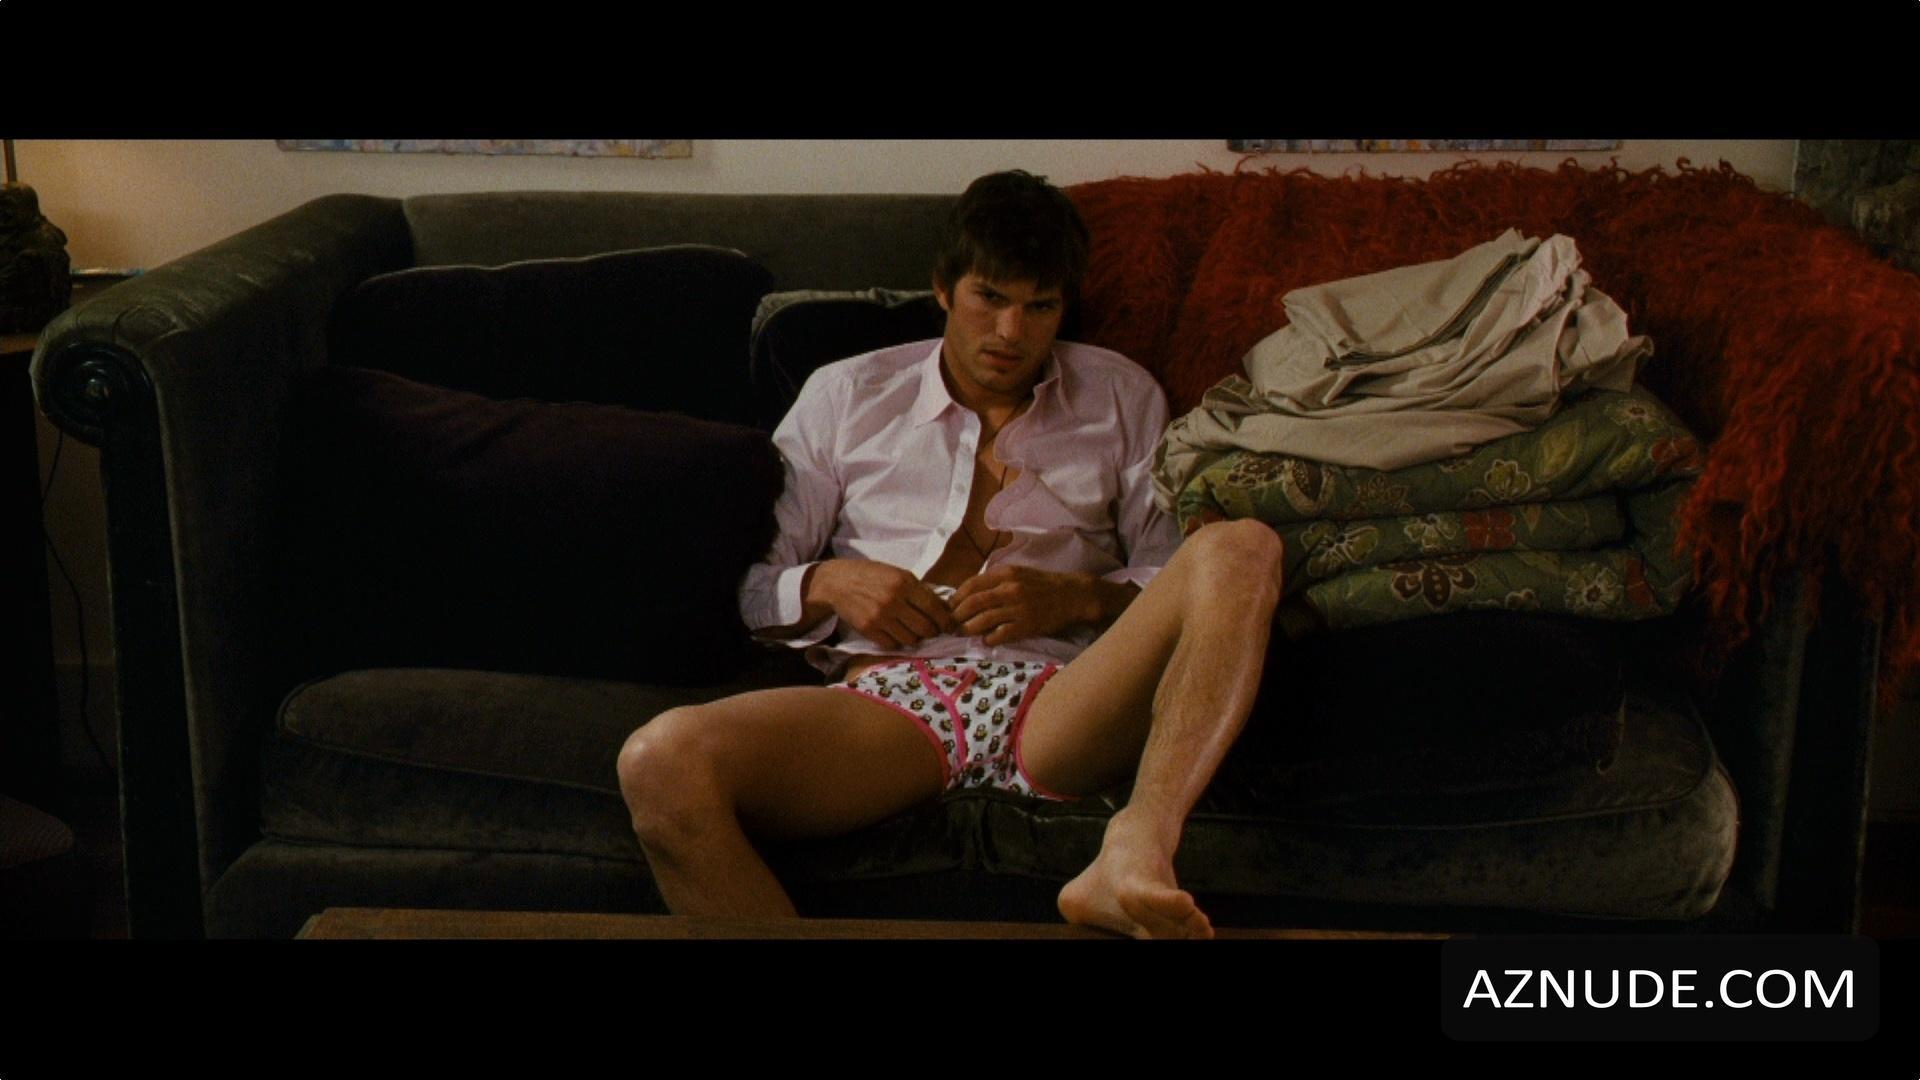 Mure recommends Bikini car wash porn